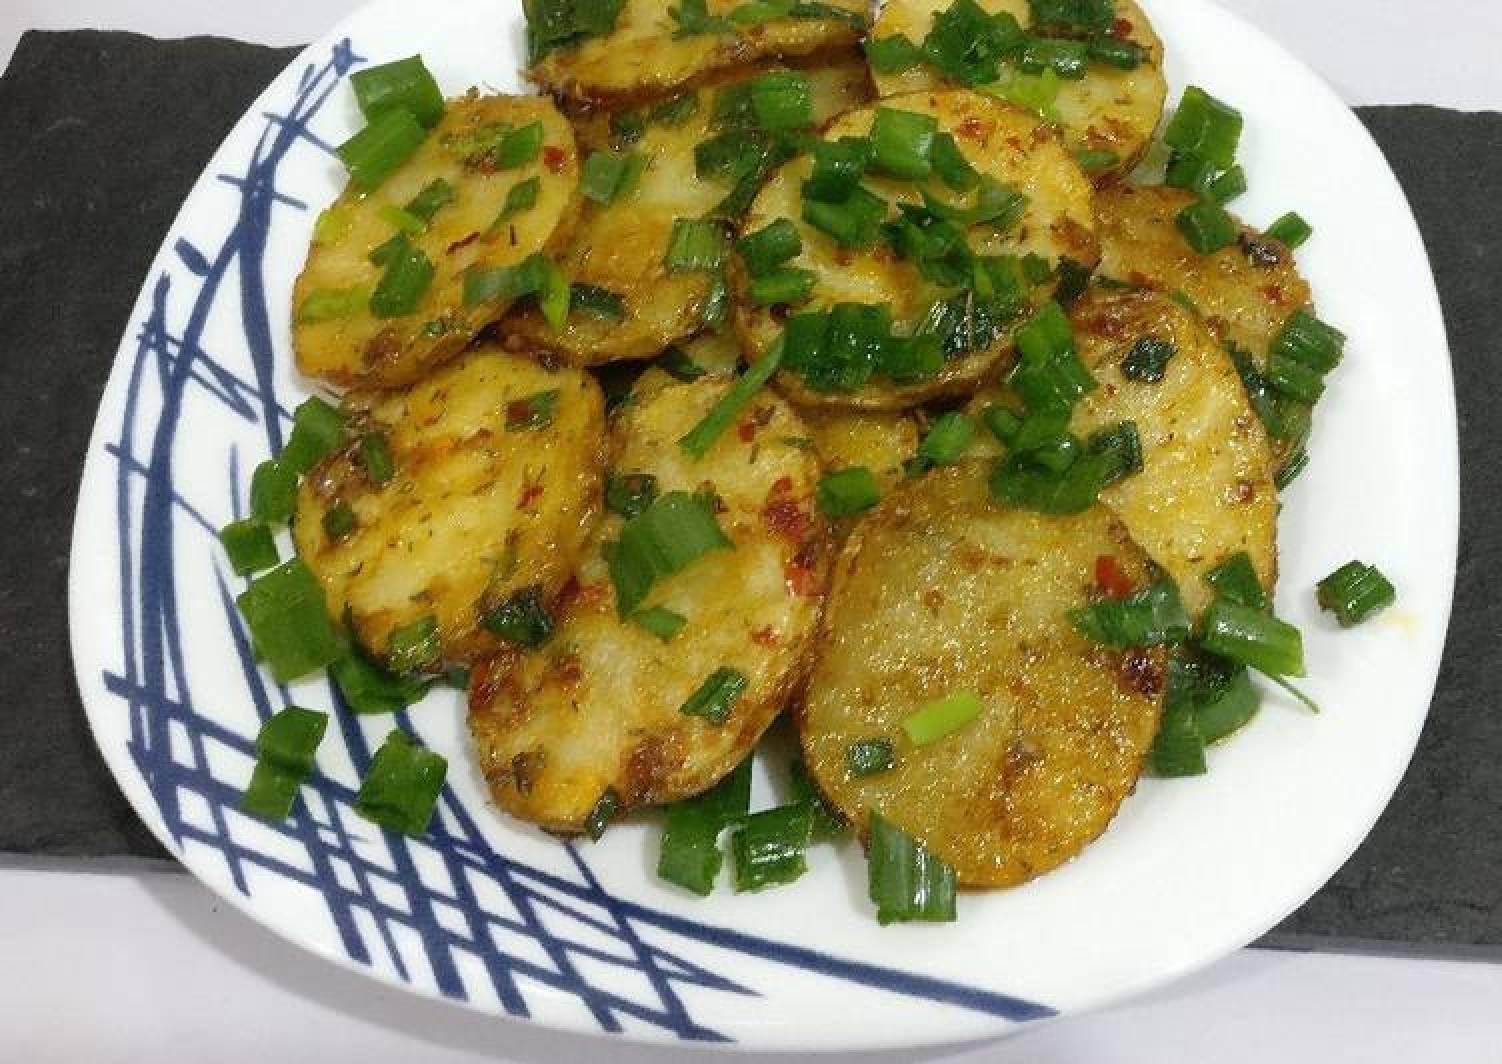 Potatoes in teriyaki sauce